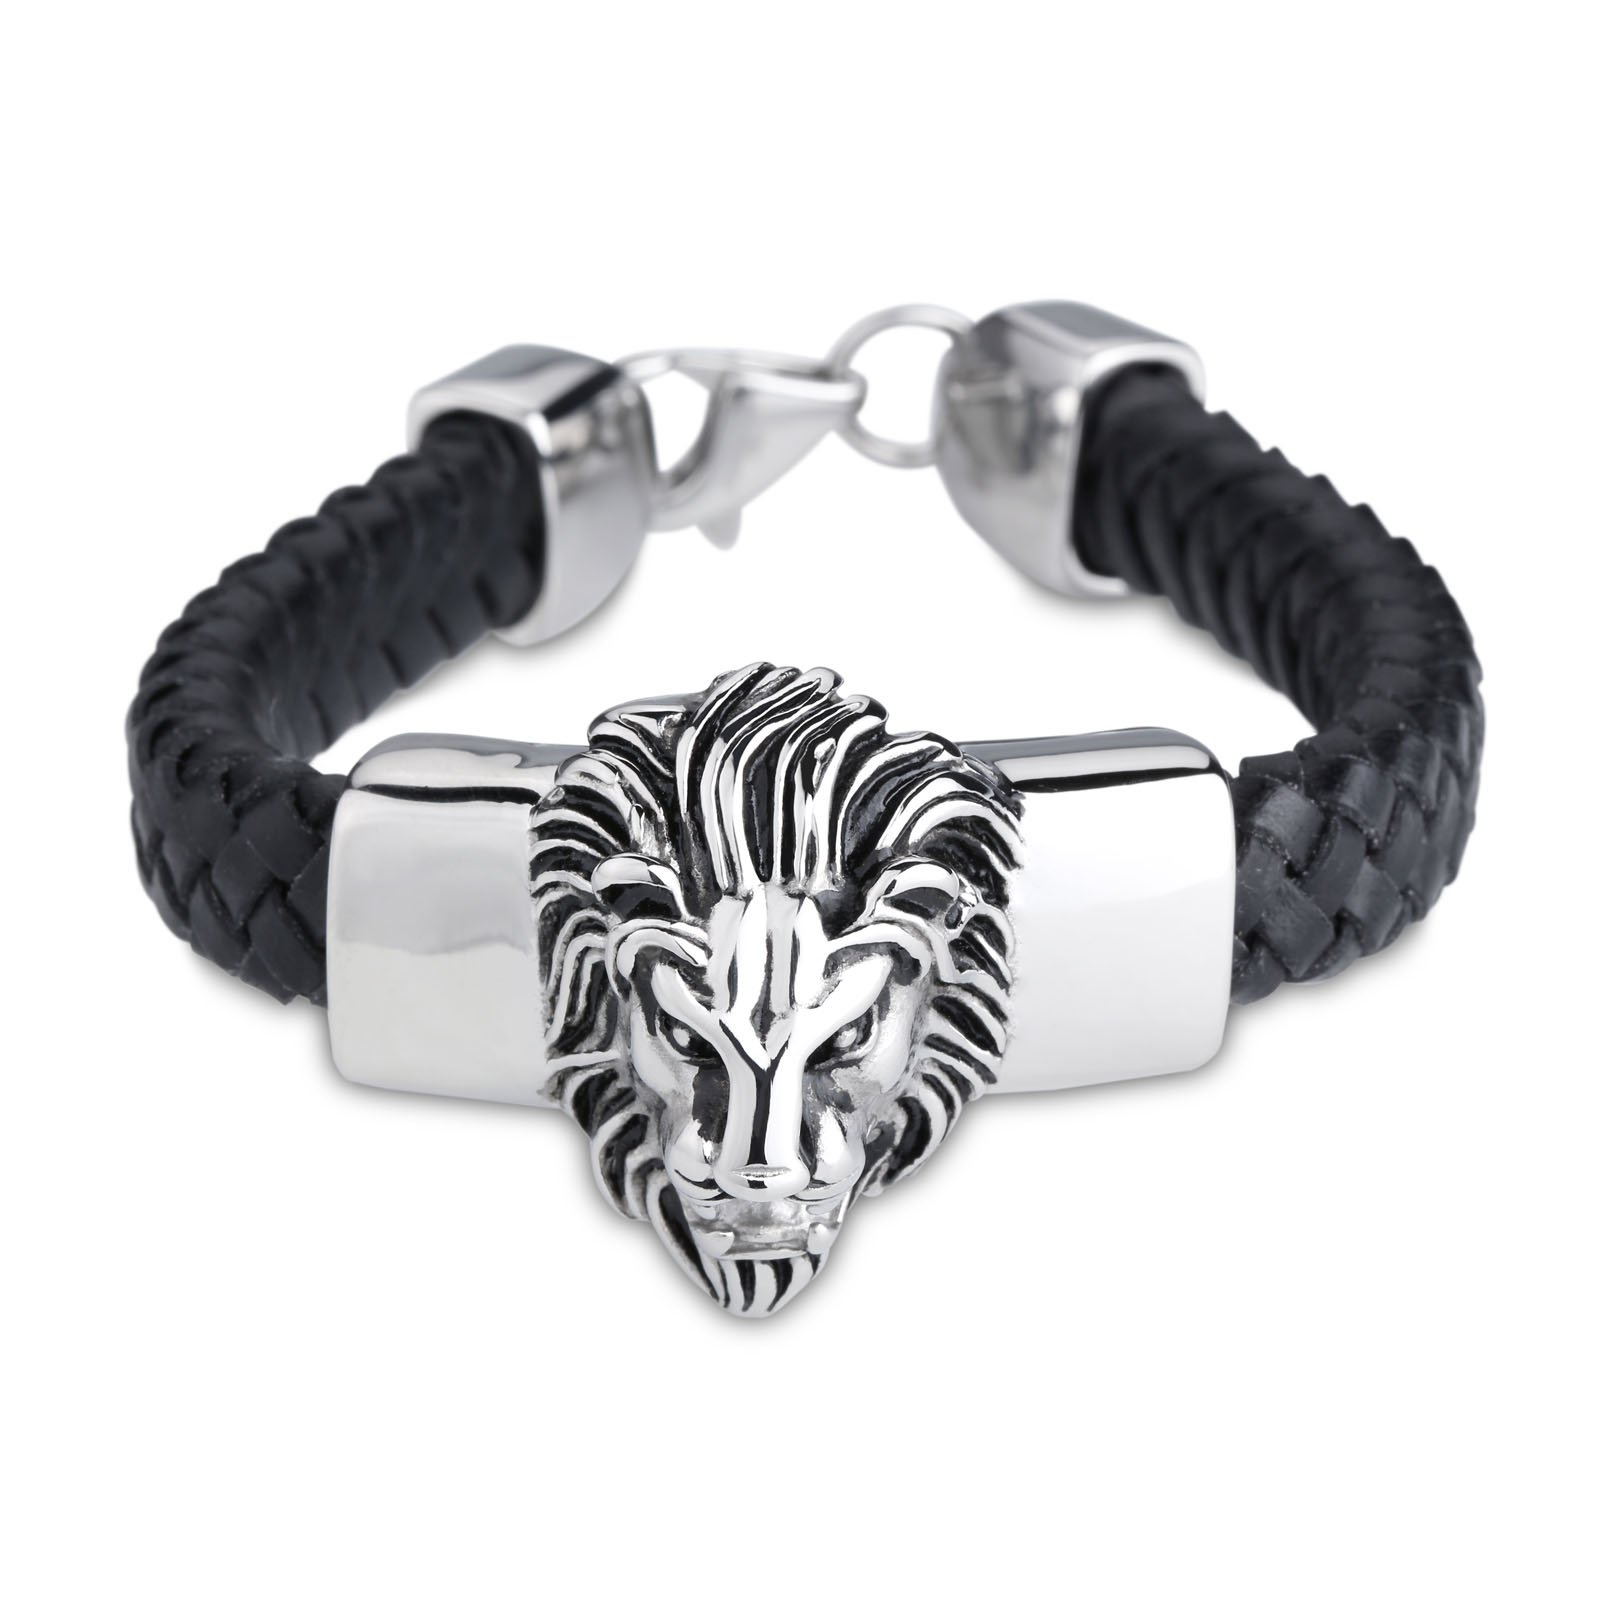 Zhiyuan Black Braided Leather Men's Bracelet with Lion Head